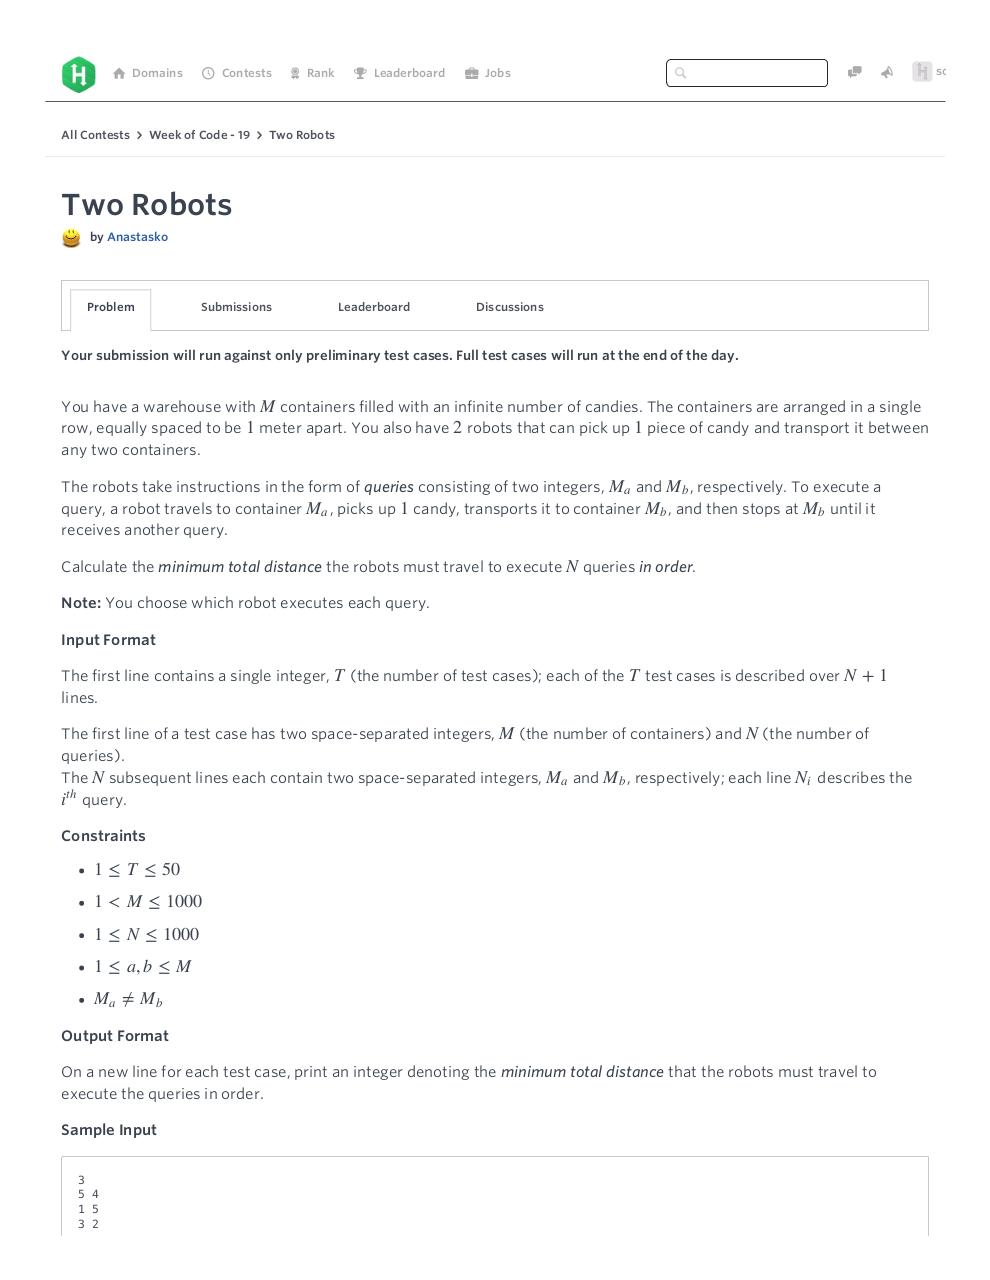 Two Robots Challenge Week of Code 19 HackerRank - PDF Archive